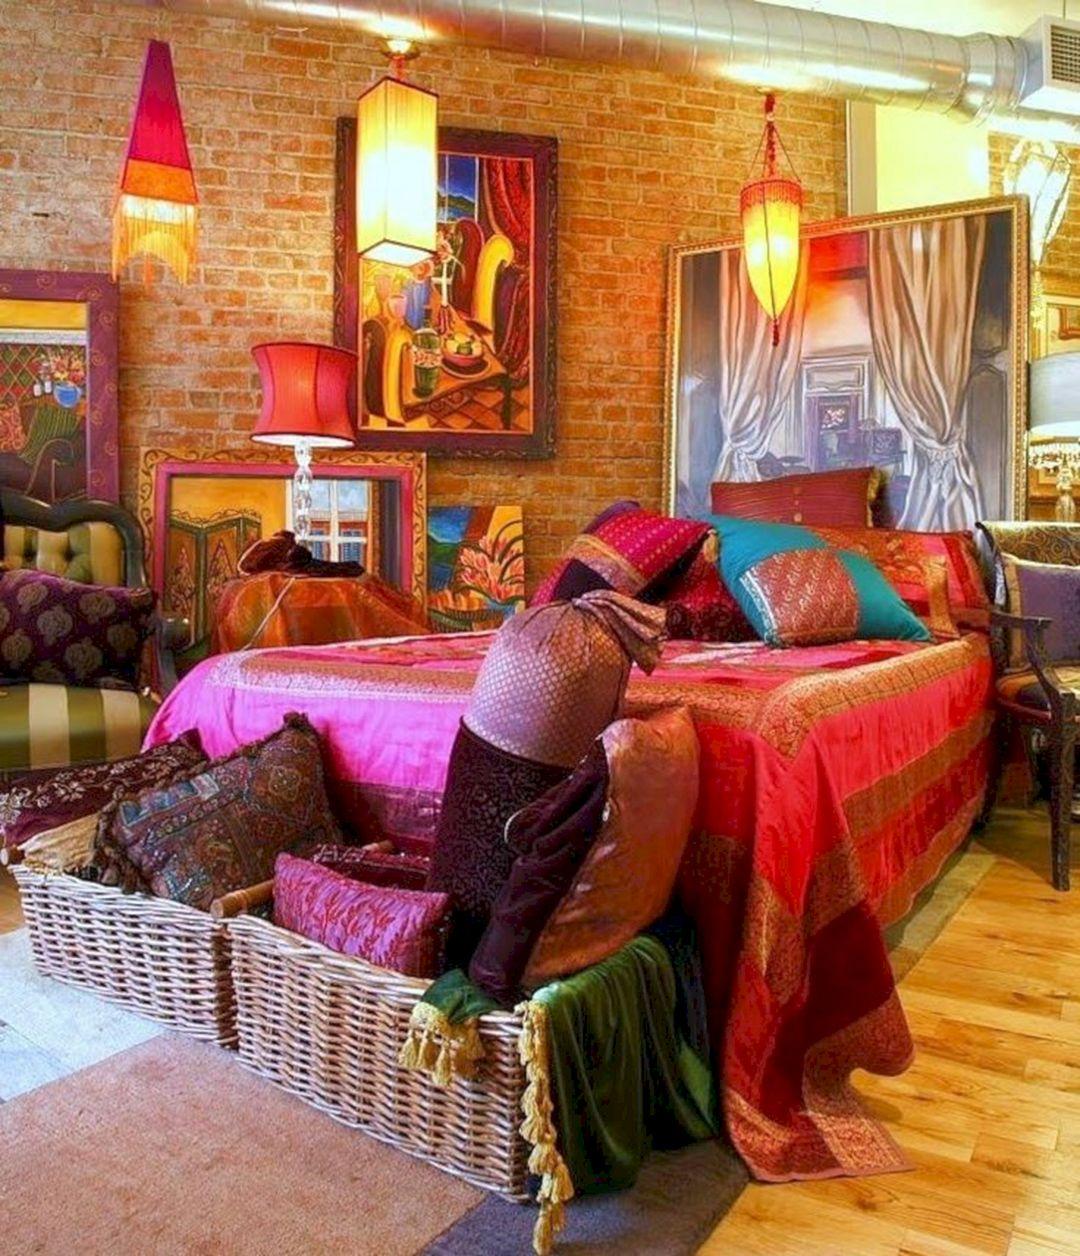 Bohemian Bedroom Decoration 2 – DECOREDO on japanese decorating, gypsy decorating, korean decorating, classic decorating, scandinavian decorating, chic decorating, victorian decorating, timeless decorating, vintage decorating, urban decorating, white decorating, earthy decorating, turkish decorating, green decorating, hippie decorating, traditional decorating, hipster decorating, france decorating, black decorating, sophisticated decorating,